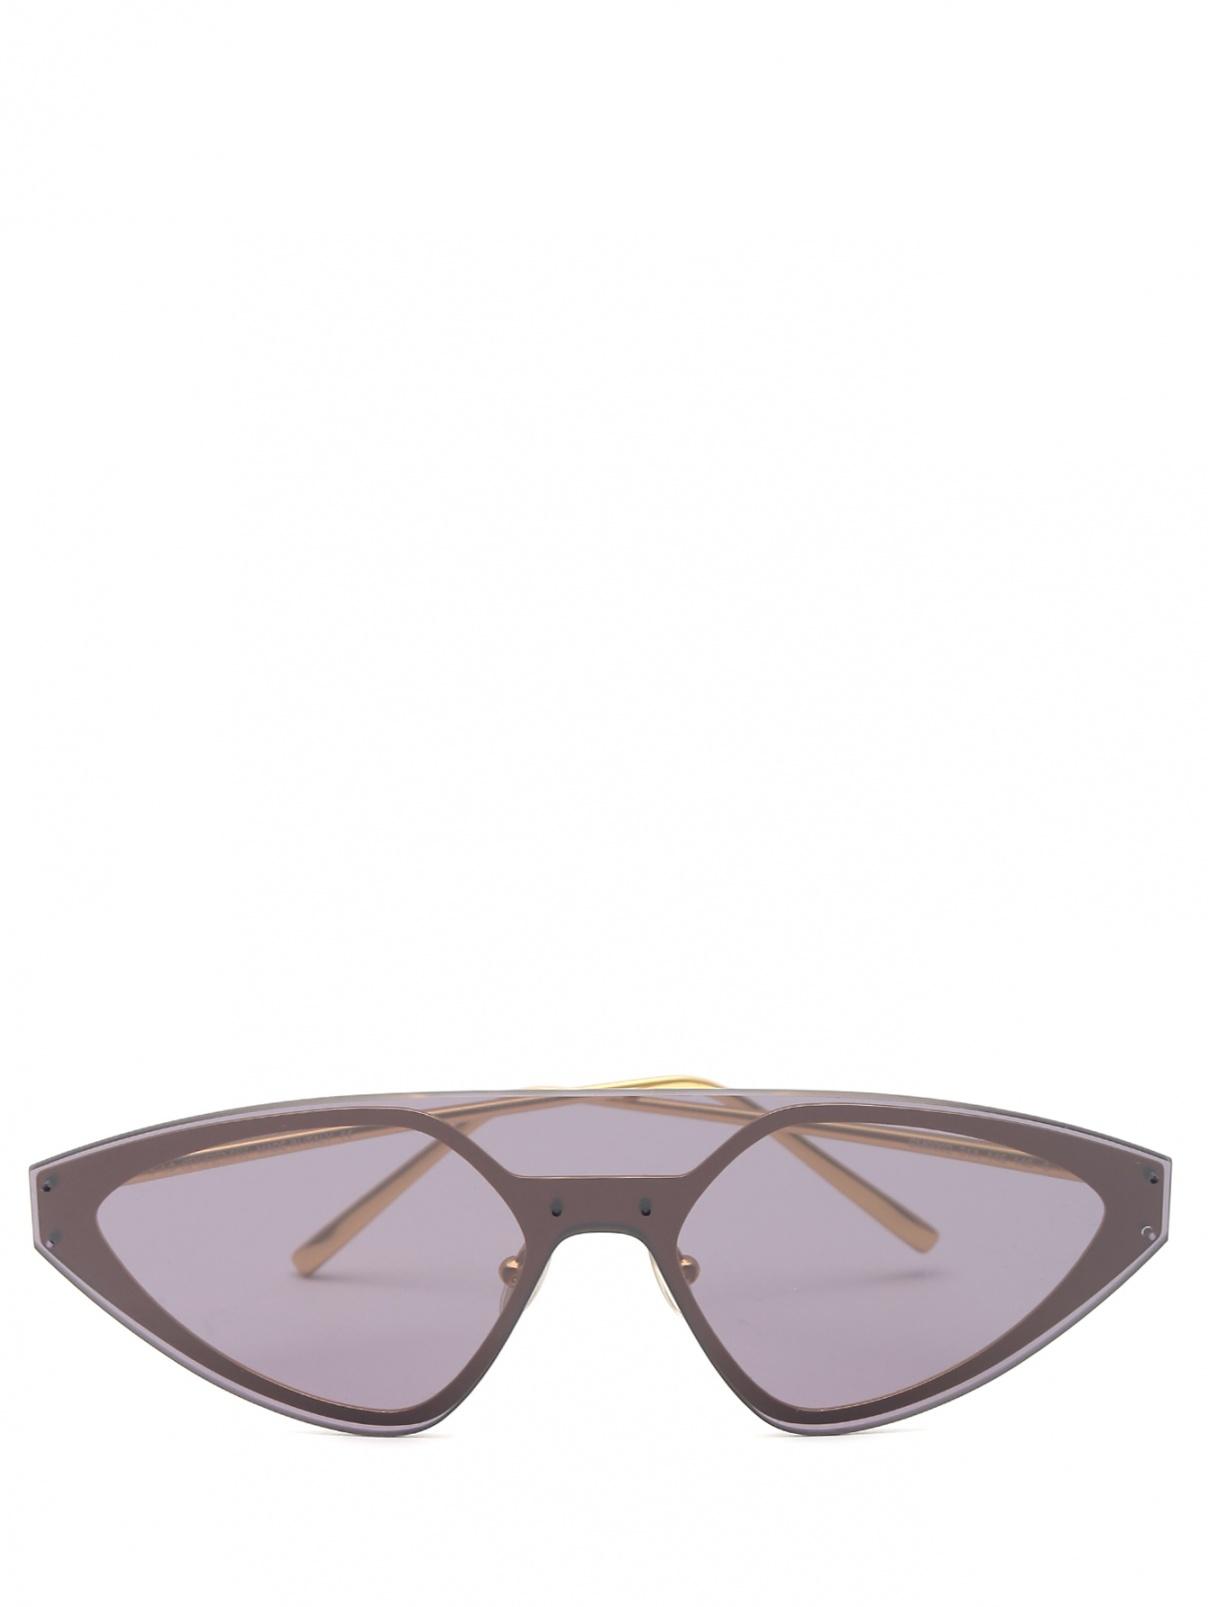 Солнцезащитные очки из пластика и металла Max Mara  –  Общий вид